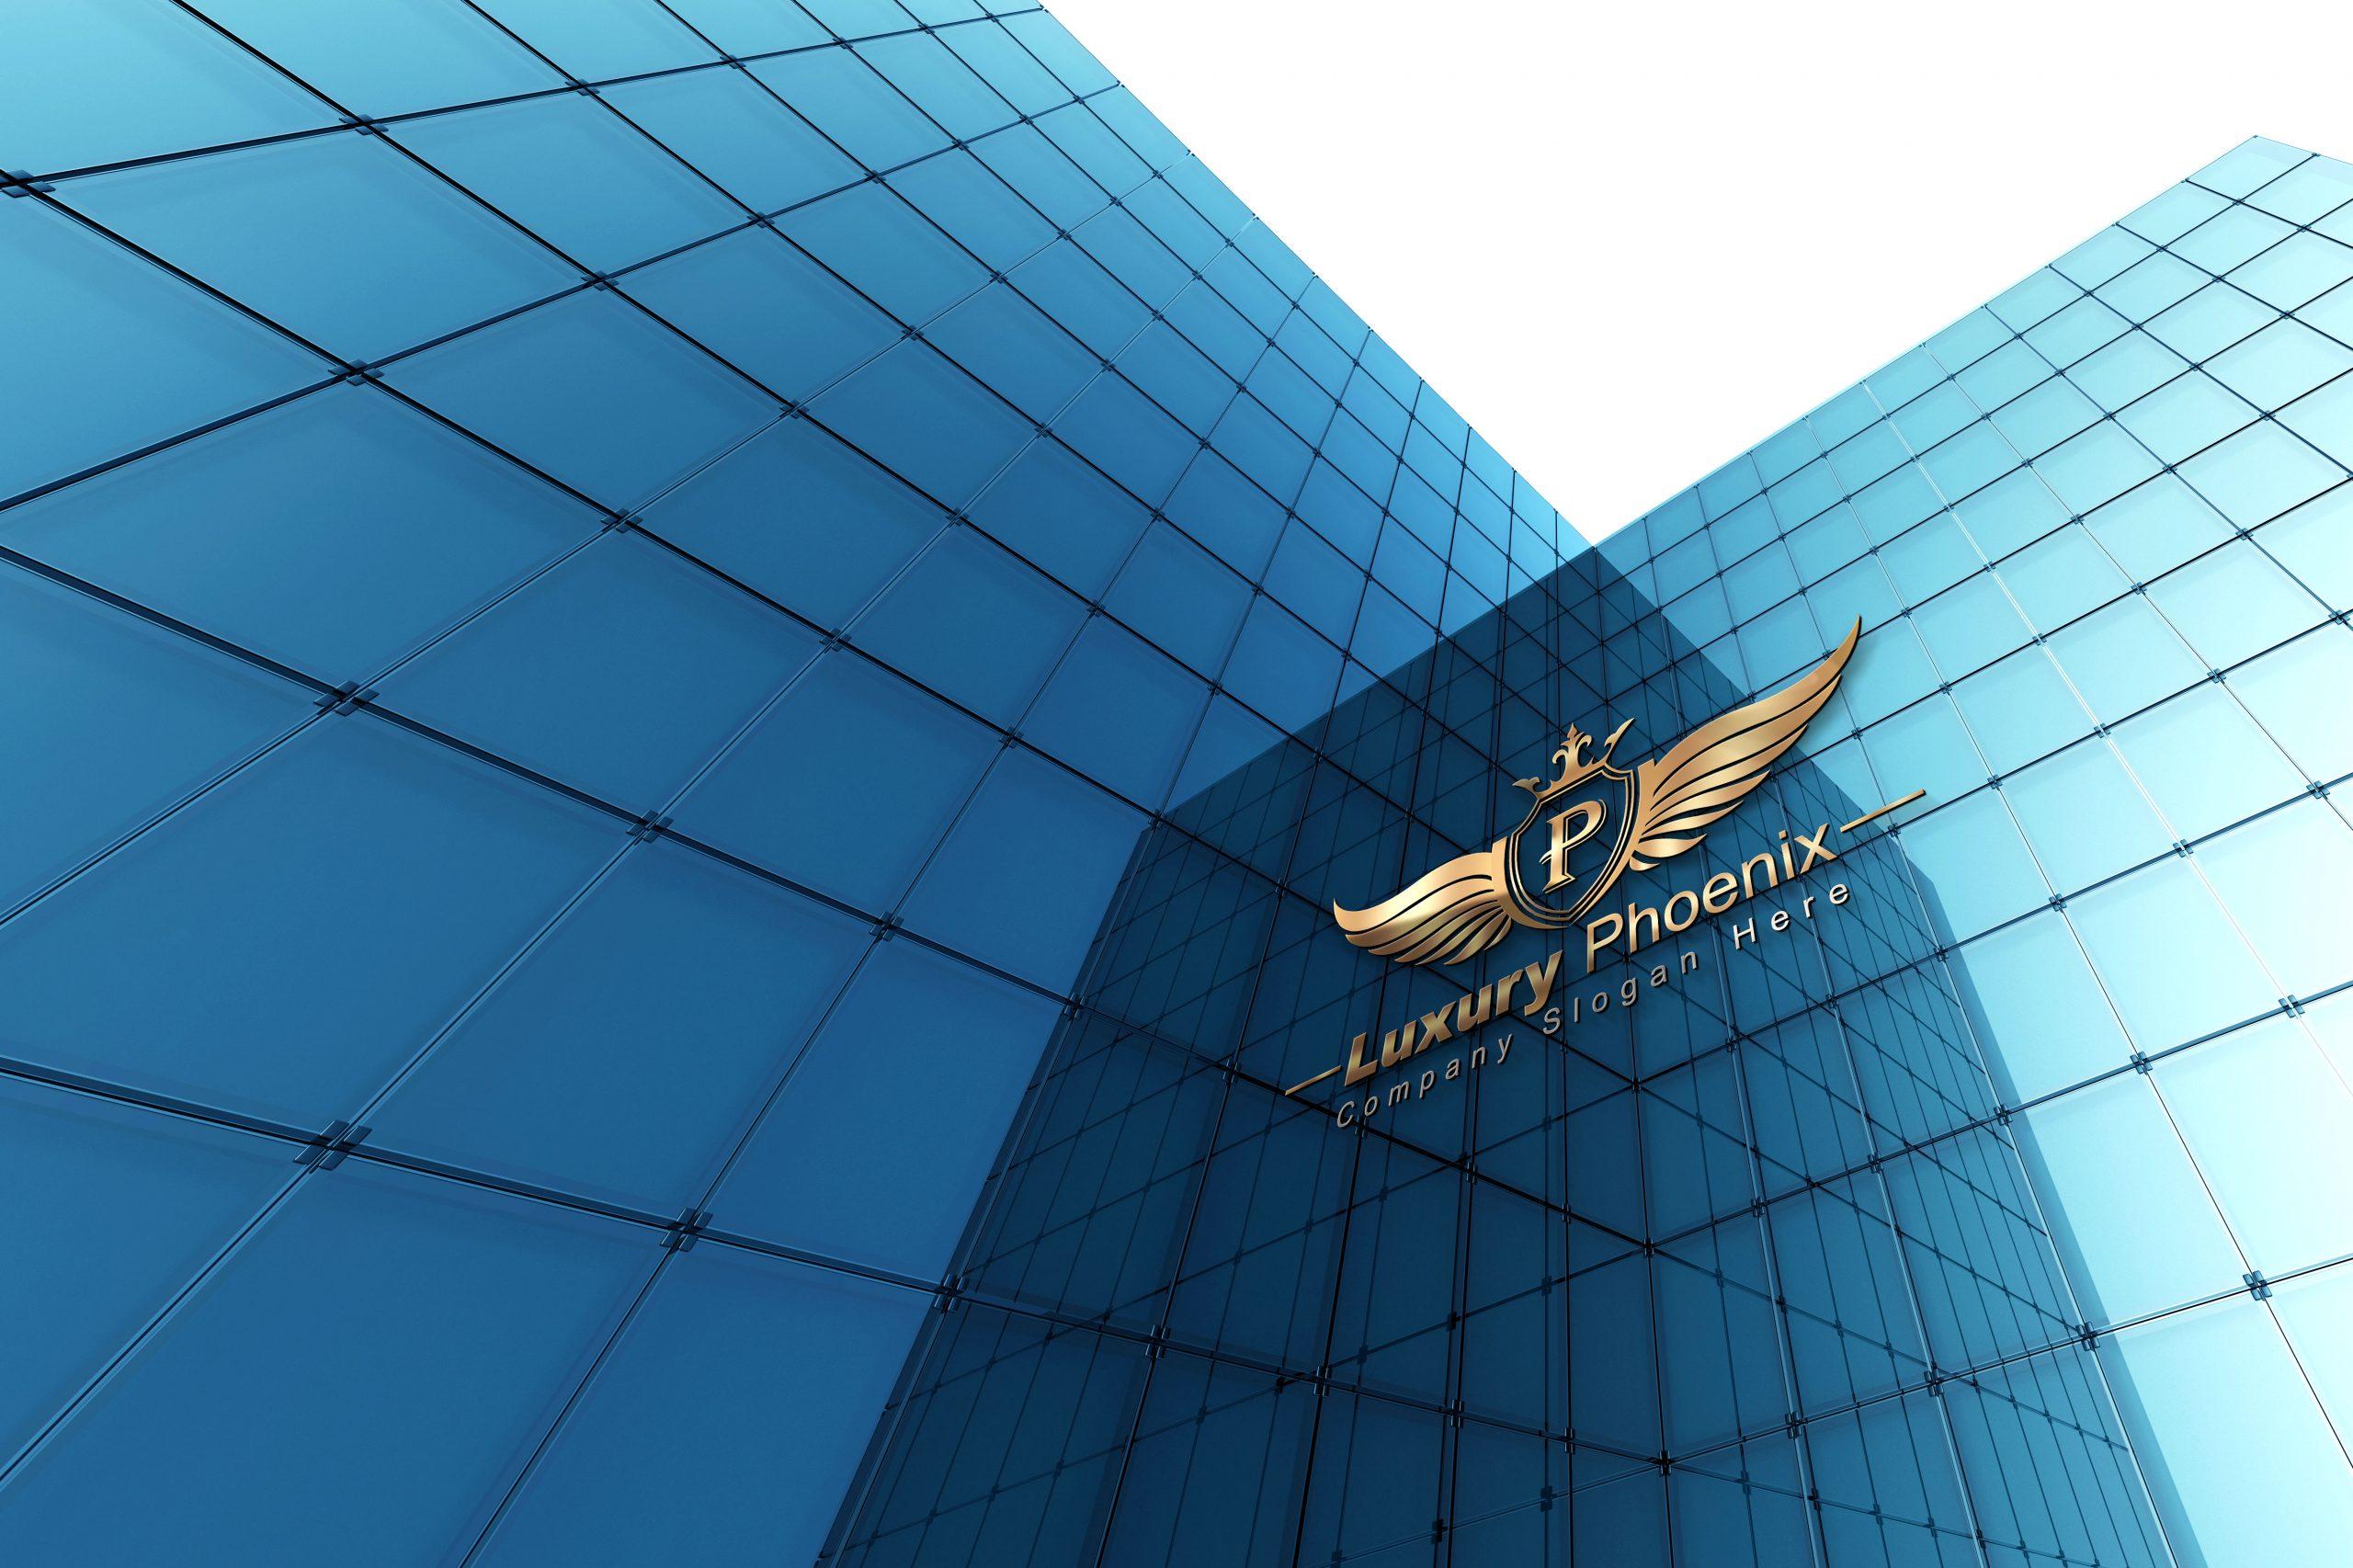 Free Luxury Phoenix Logo Design Download